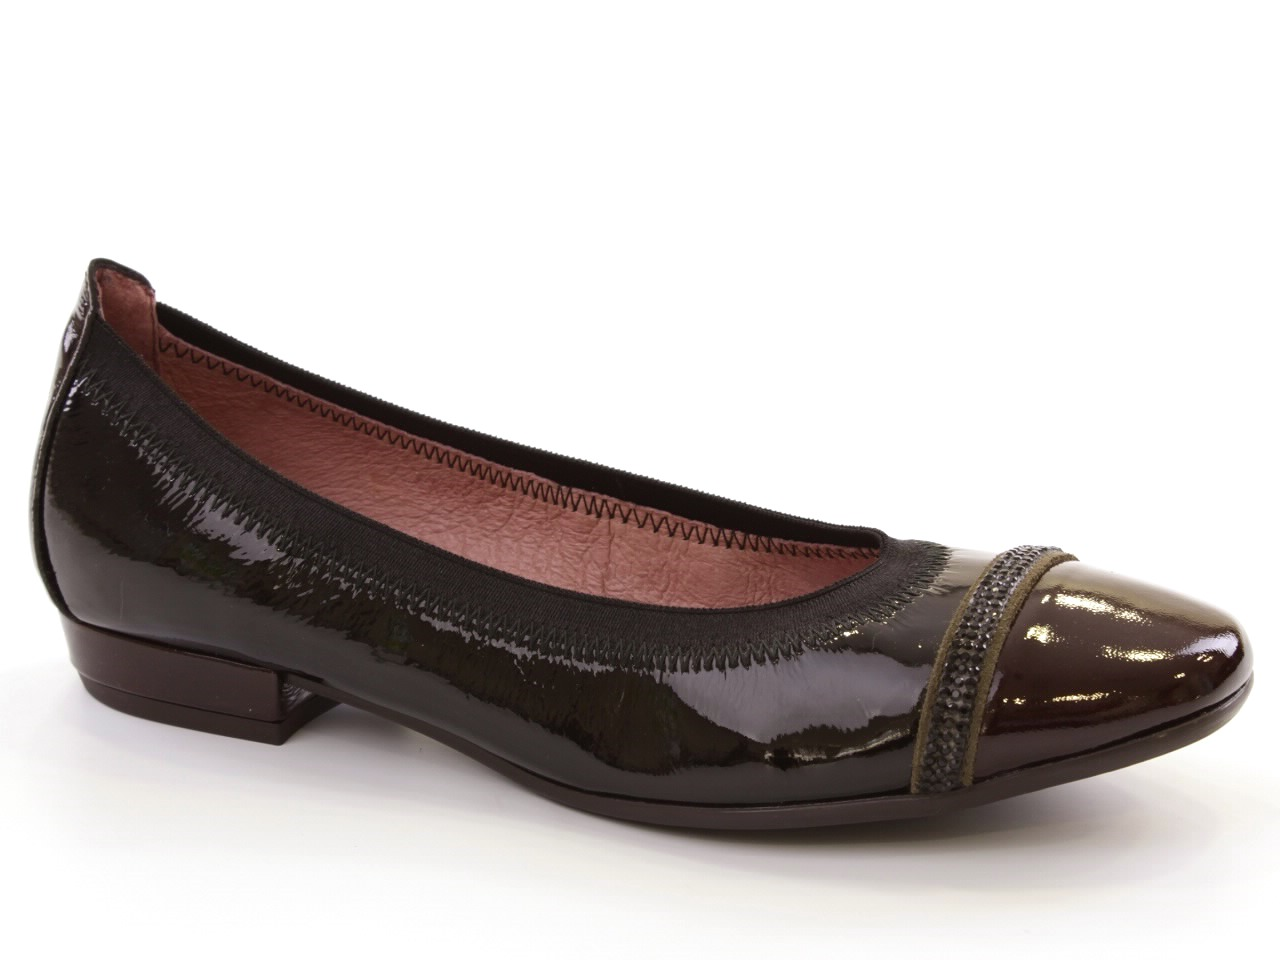 Sapatos Baixos, Sabrinas, Mocassins Hispanitas - 165 CHI40216